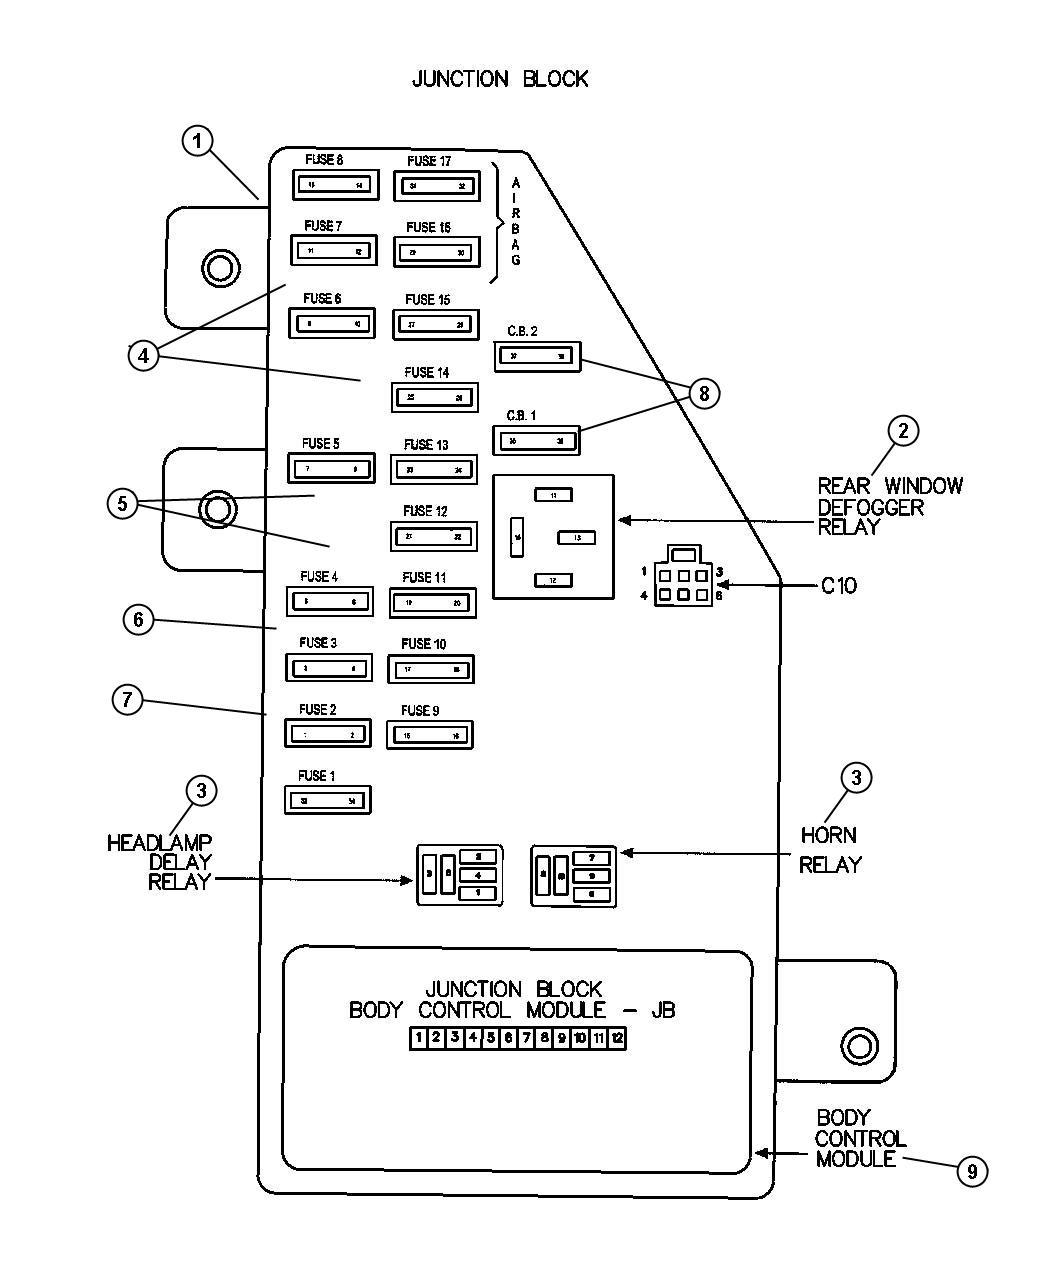 2004 dodge stratus window wiring diagram